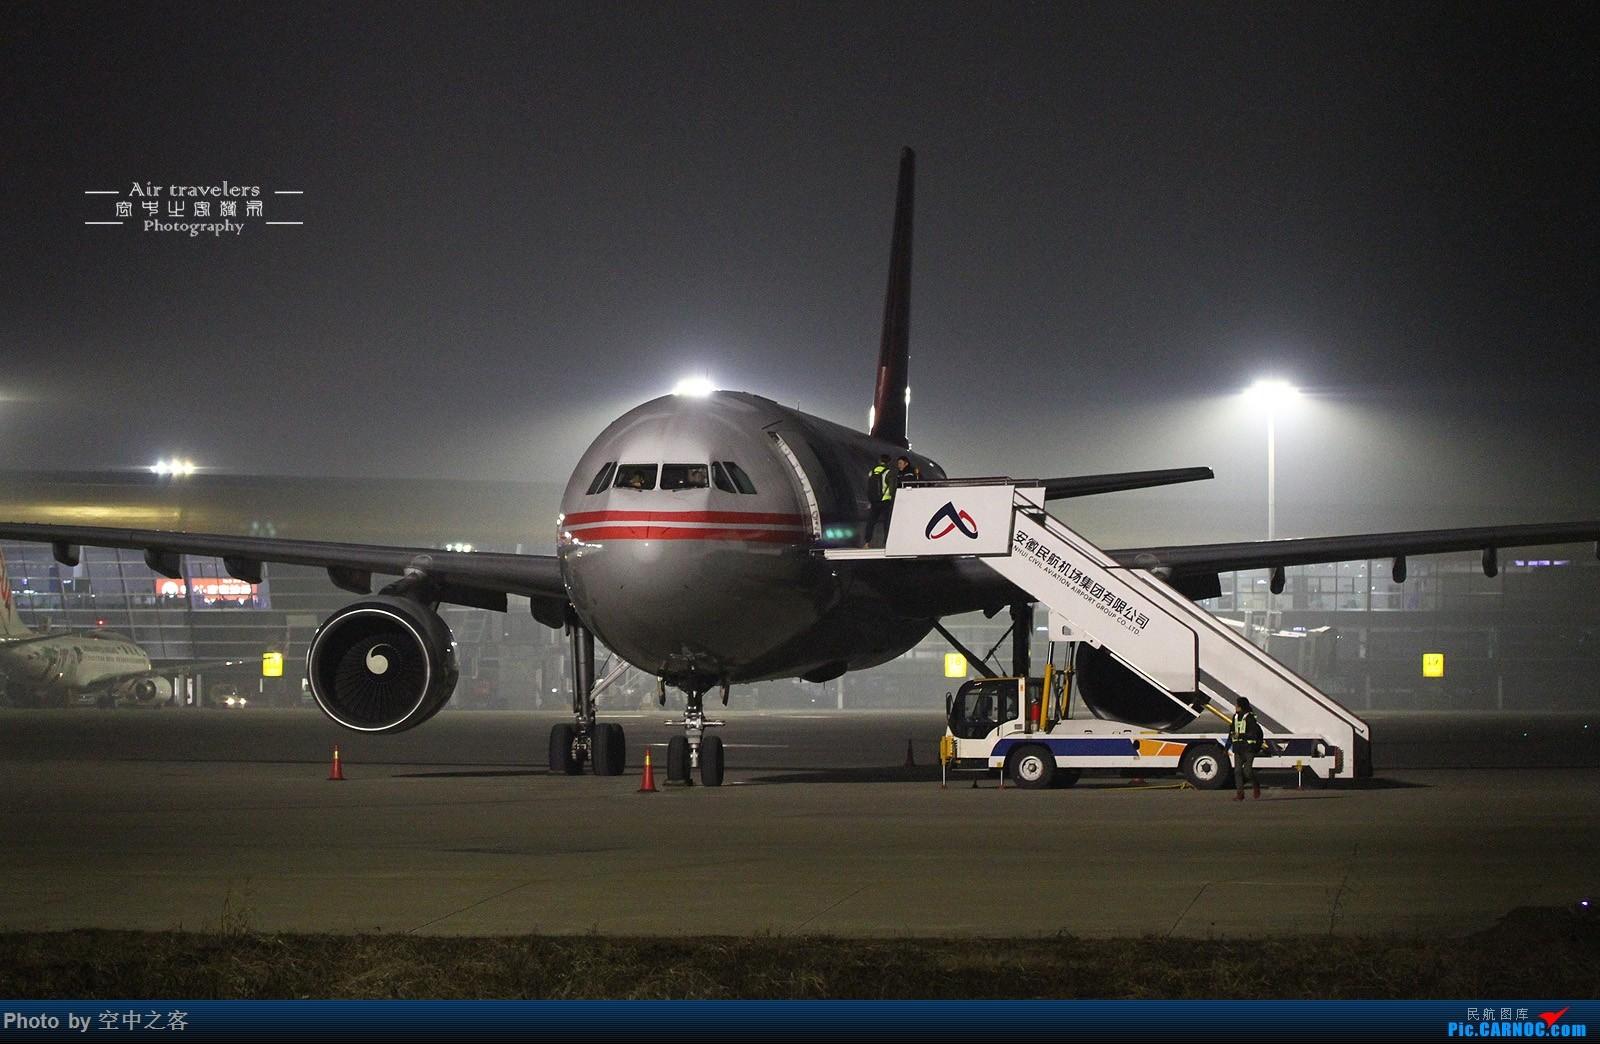 Re:[原创][合肥飞友会·霸都打机队·空中之客发布]2019年我桥机场 第一次拍机  AIRBUS A300B4-600 B-2325 合肥新桥国际机场